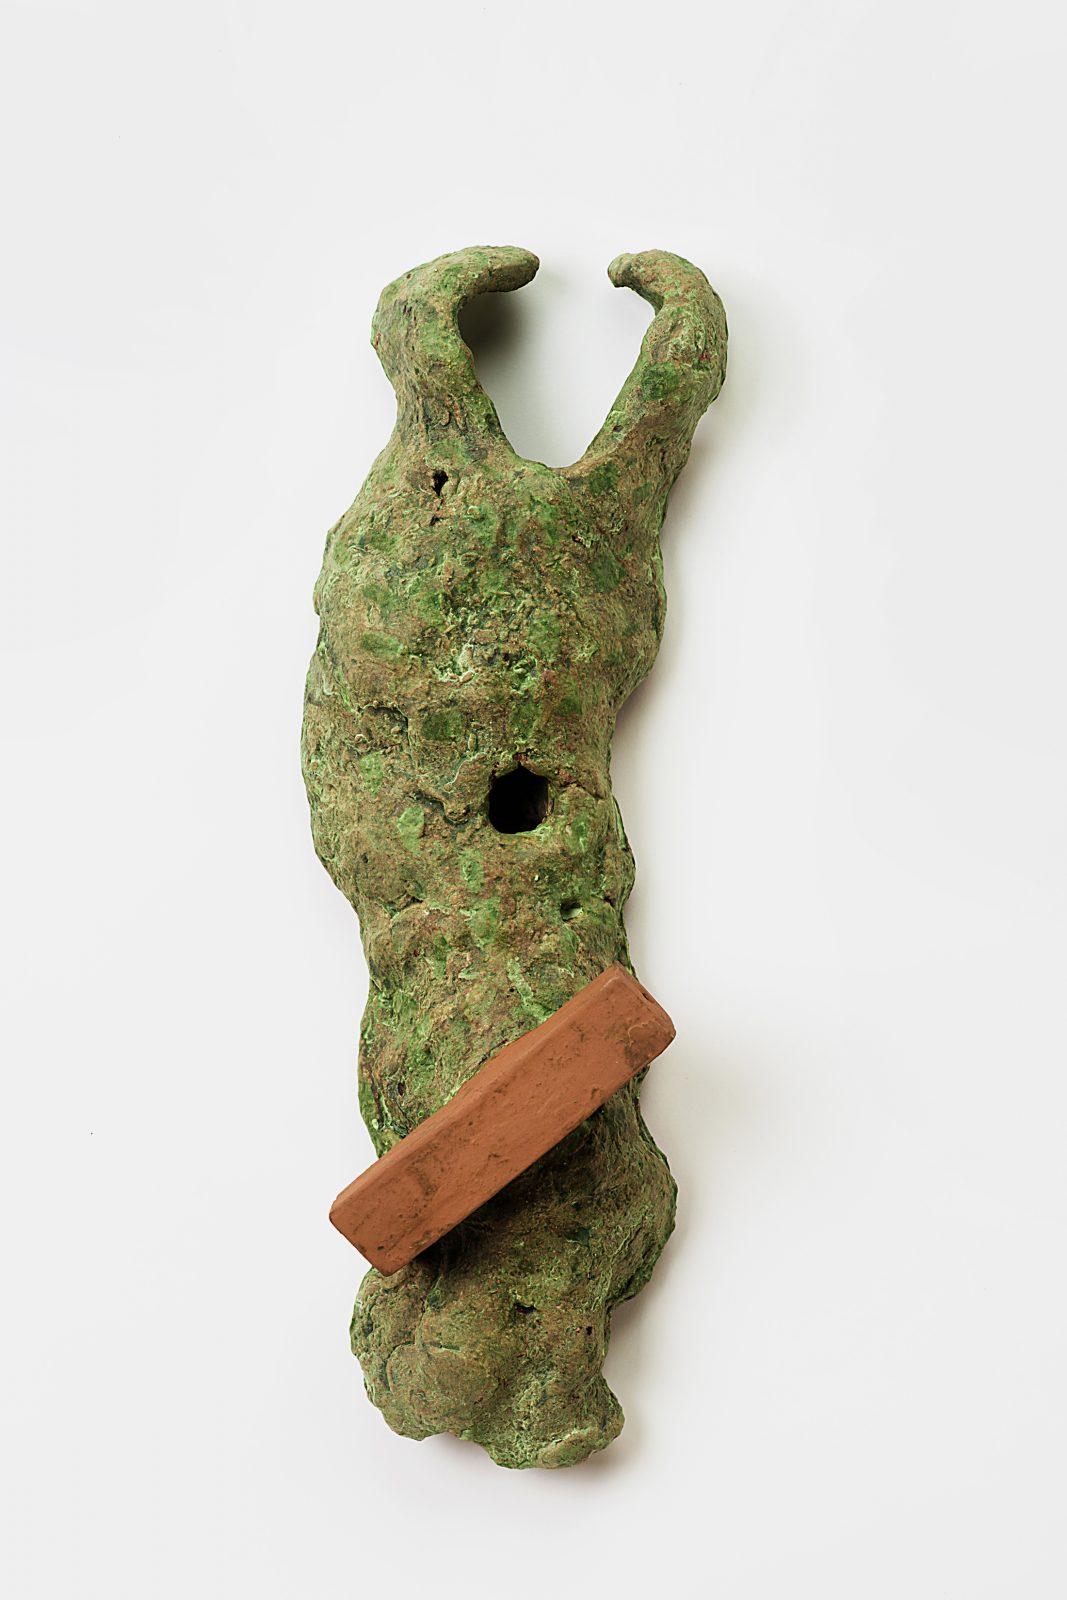 Klaus Lehmann –Faun –2012, 41x13x9cm –Galerie Metzger Gallery Johannesberg Nachlass-Verwaltung Kunst Plastik Sculpture Art Ceramics